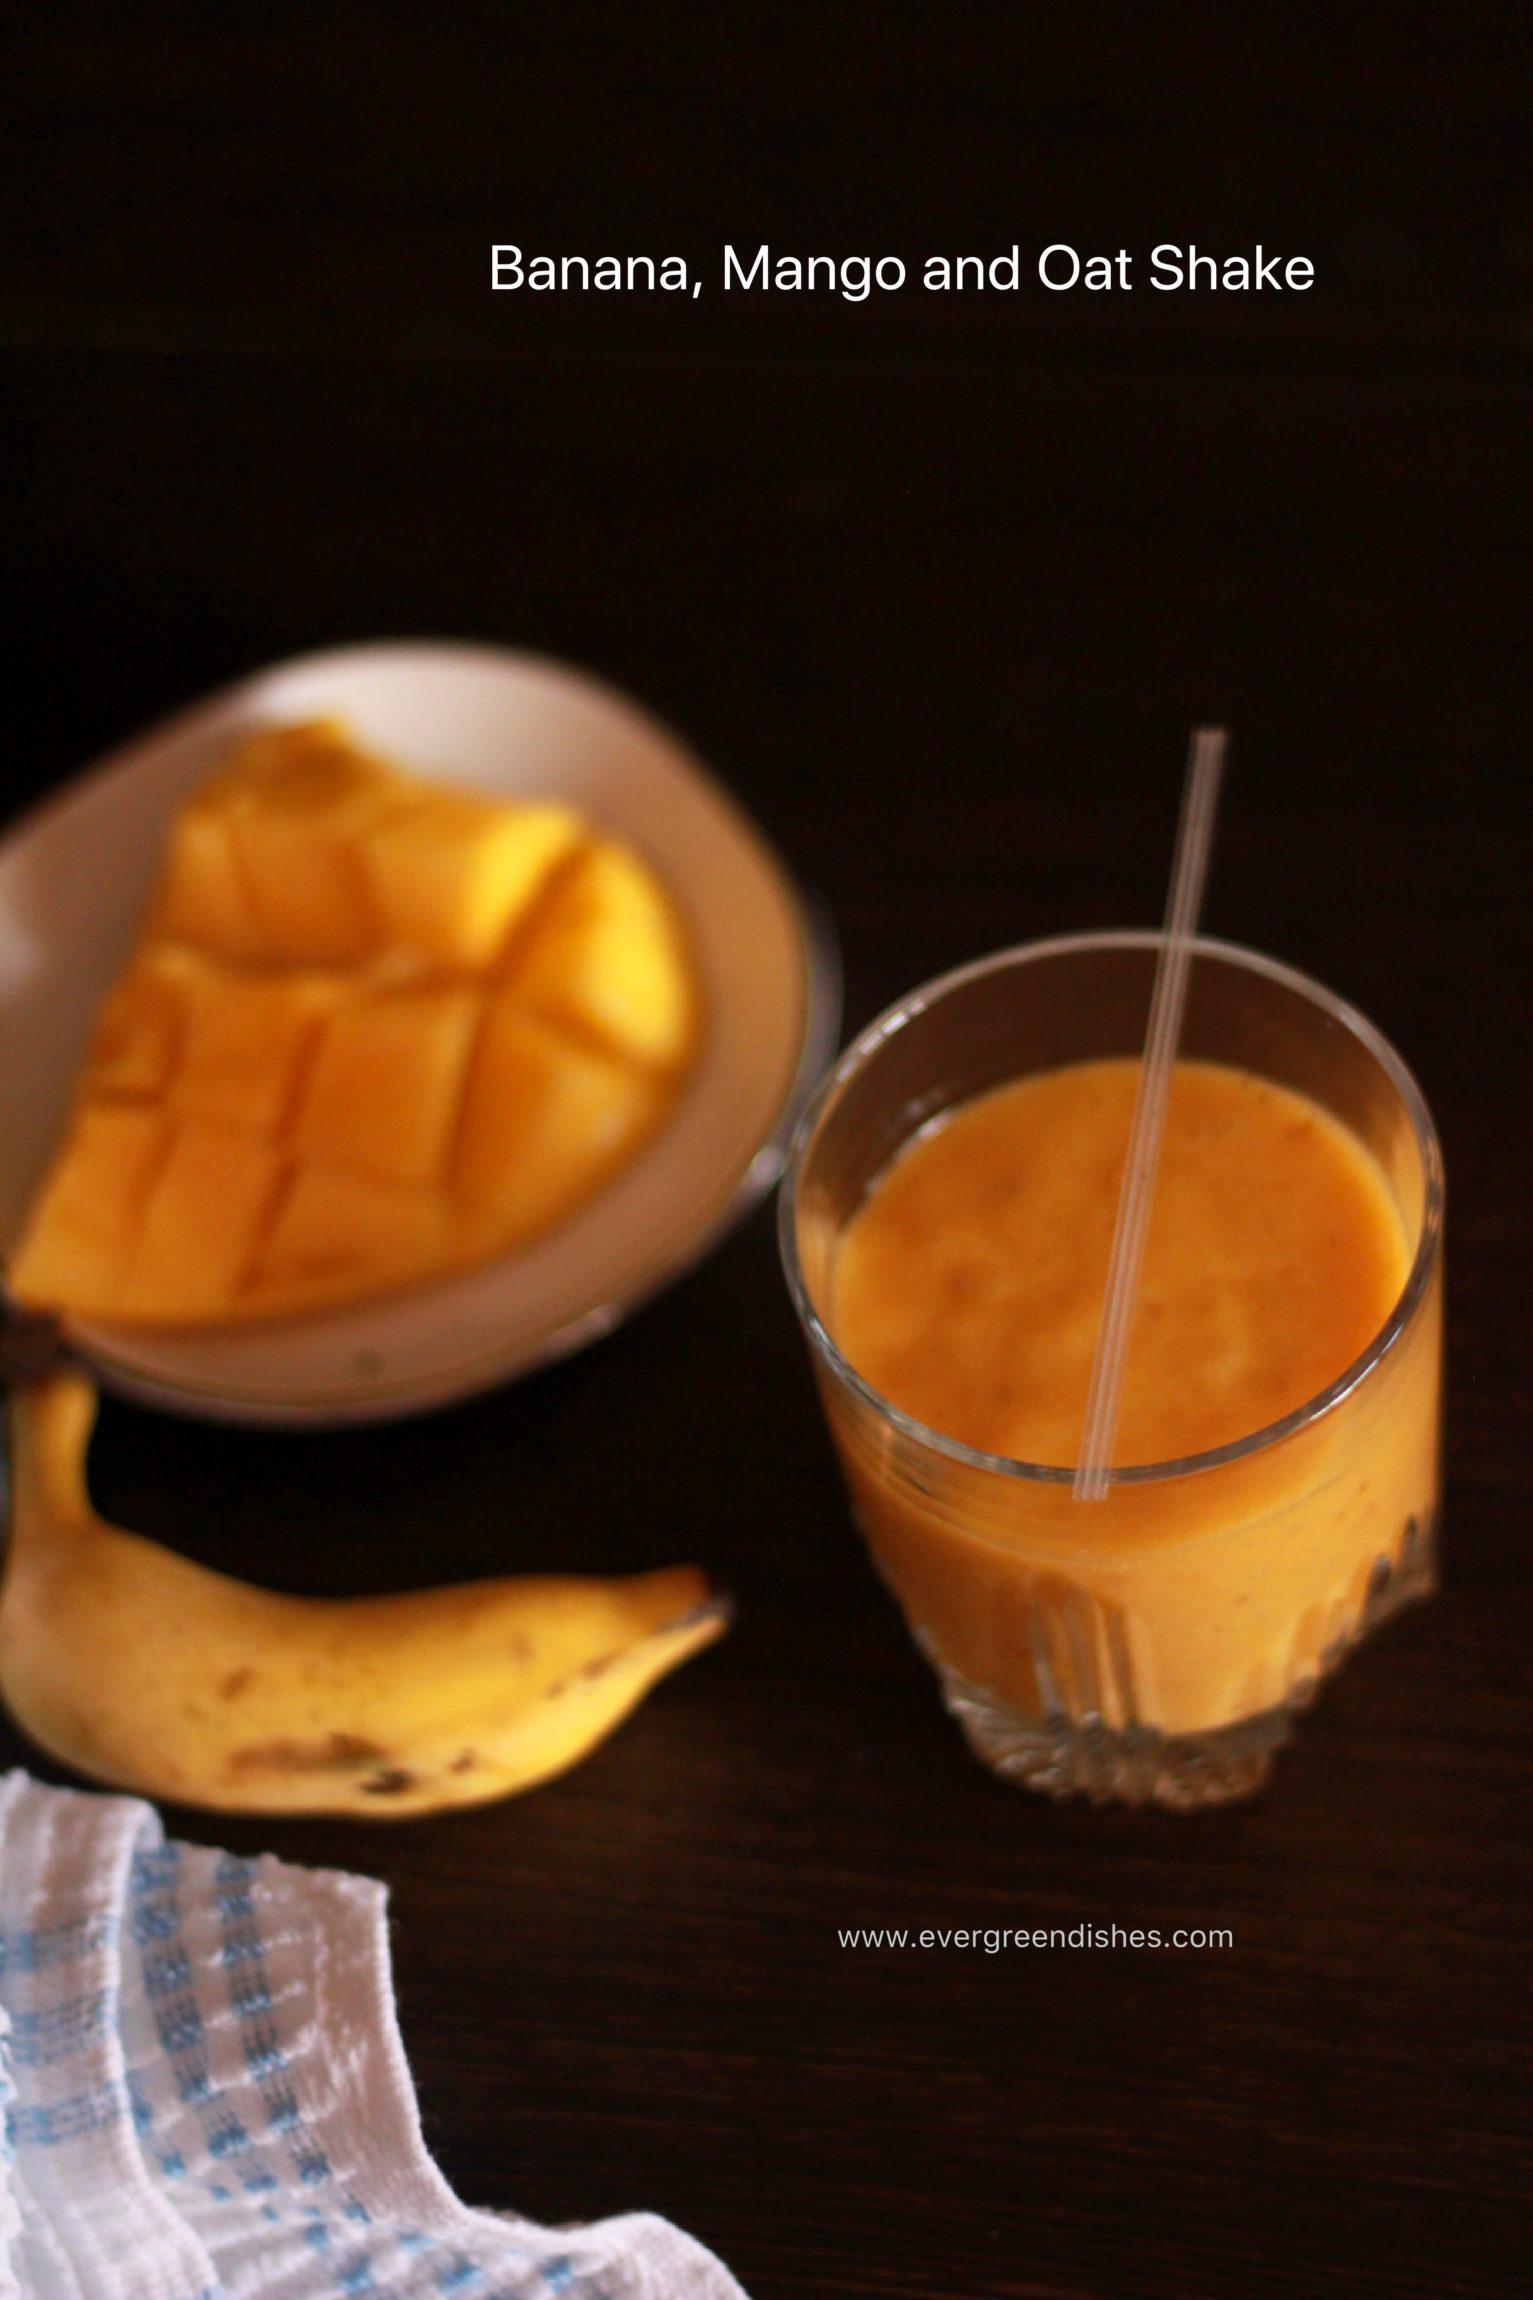 banana mango oat shake milkshake Banana  Mango Oat Shake banana mango milkshake 1533x2300